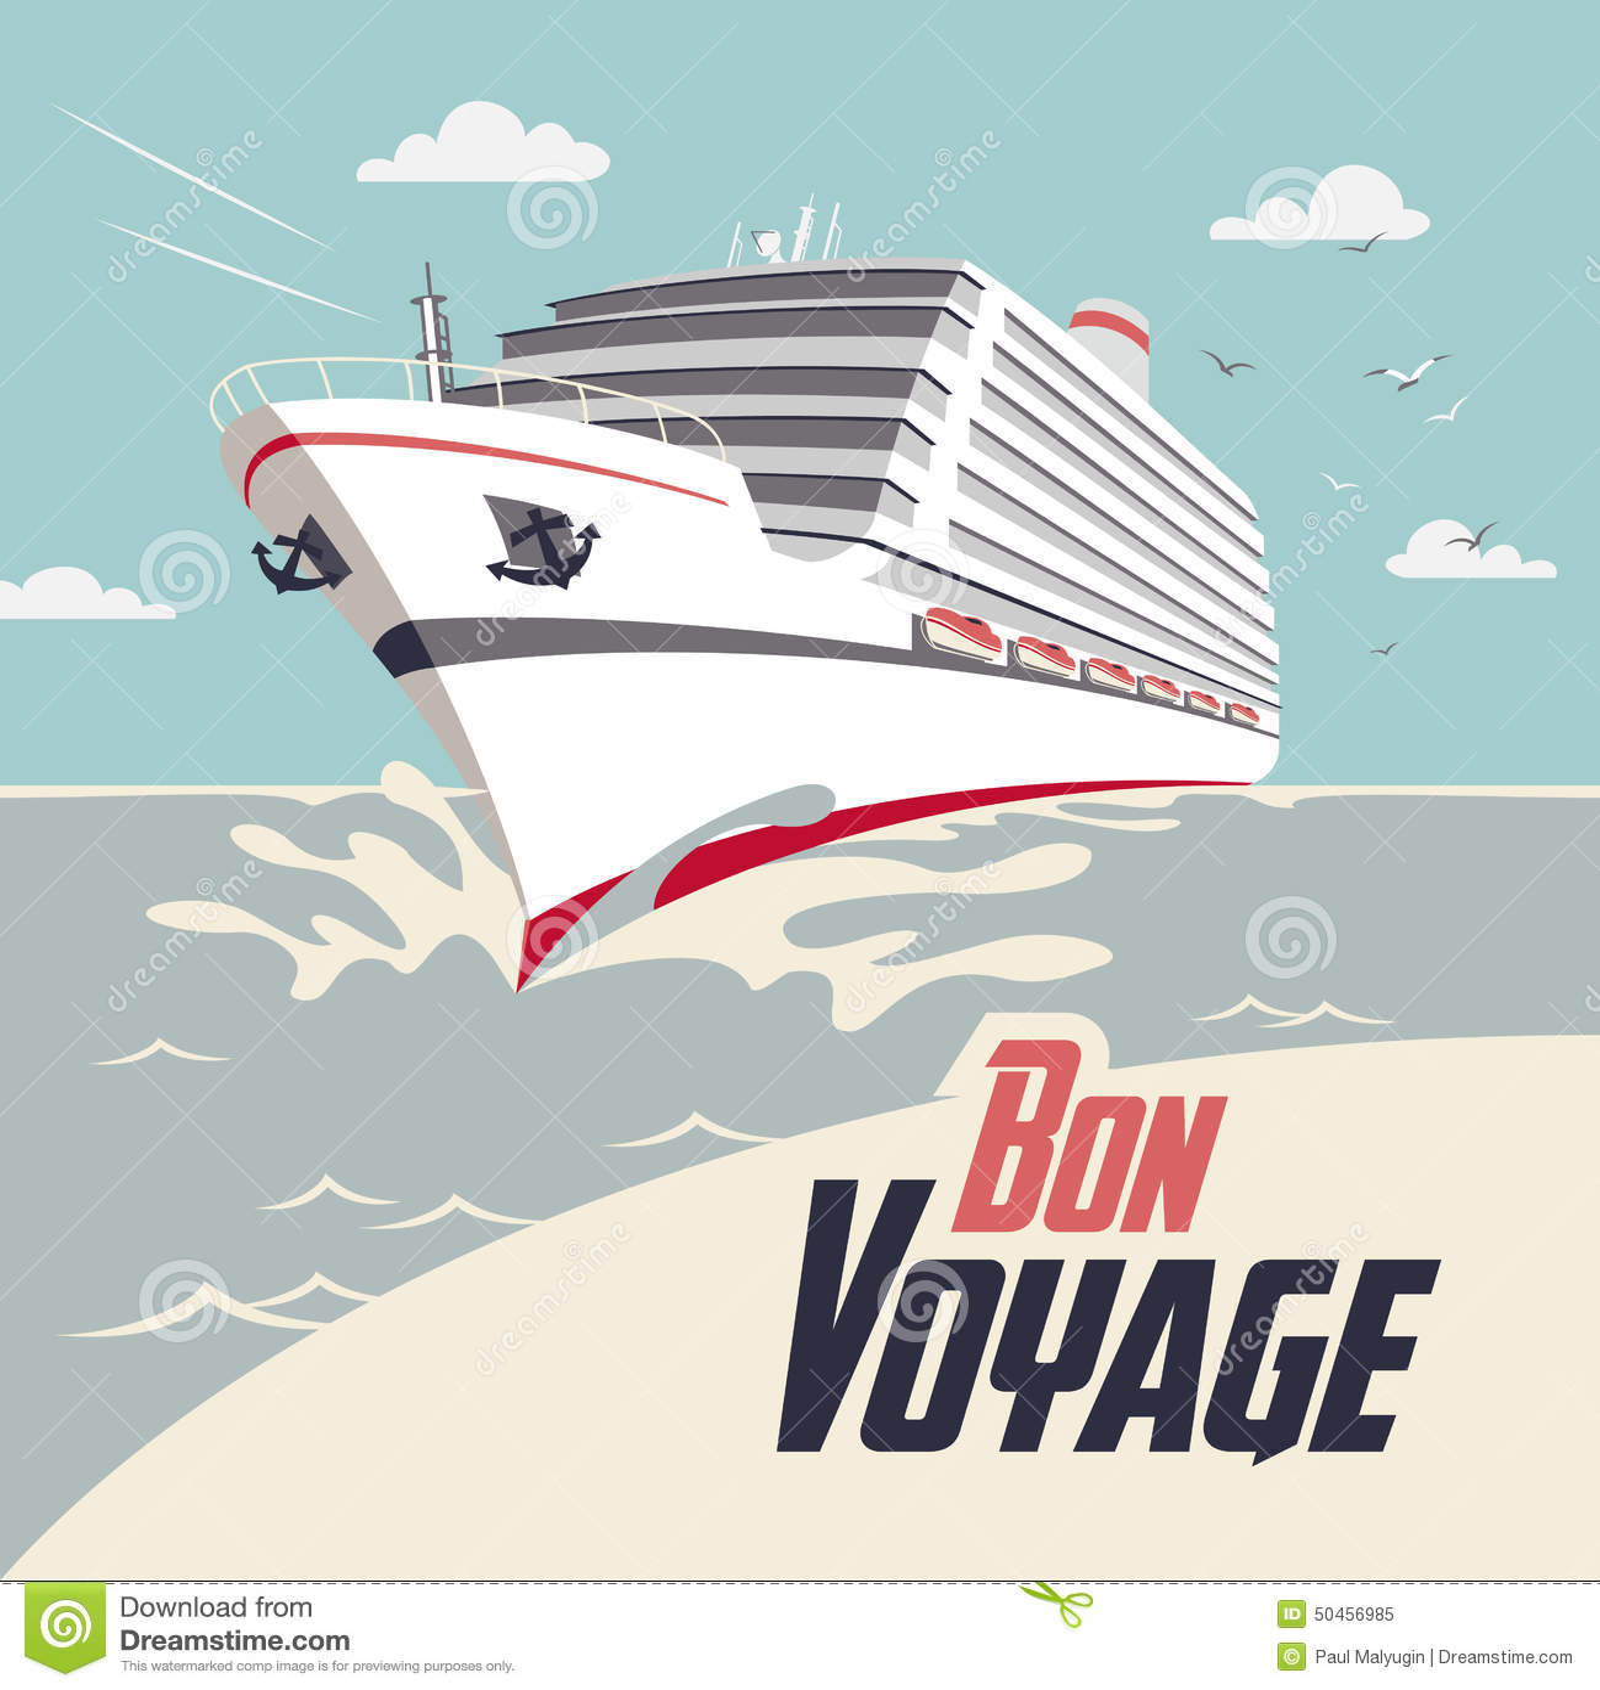 Cruise Ship Bon Voyage Illustration Stock Vector Image